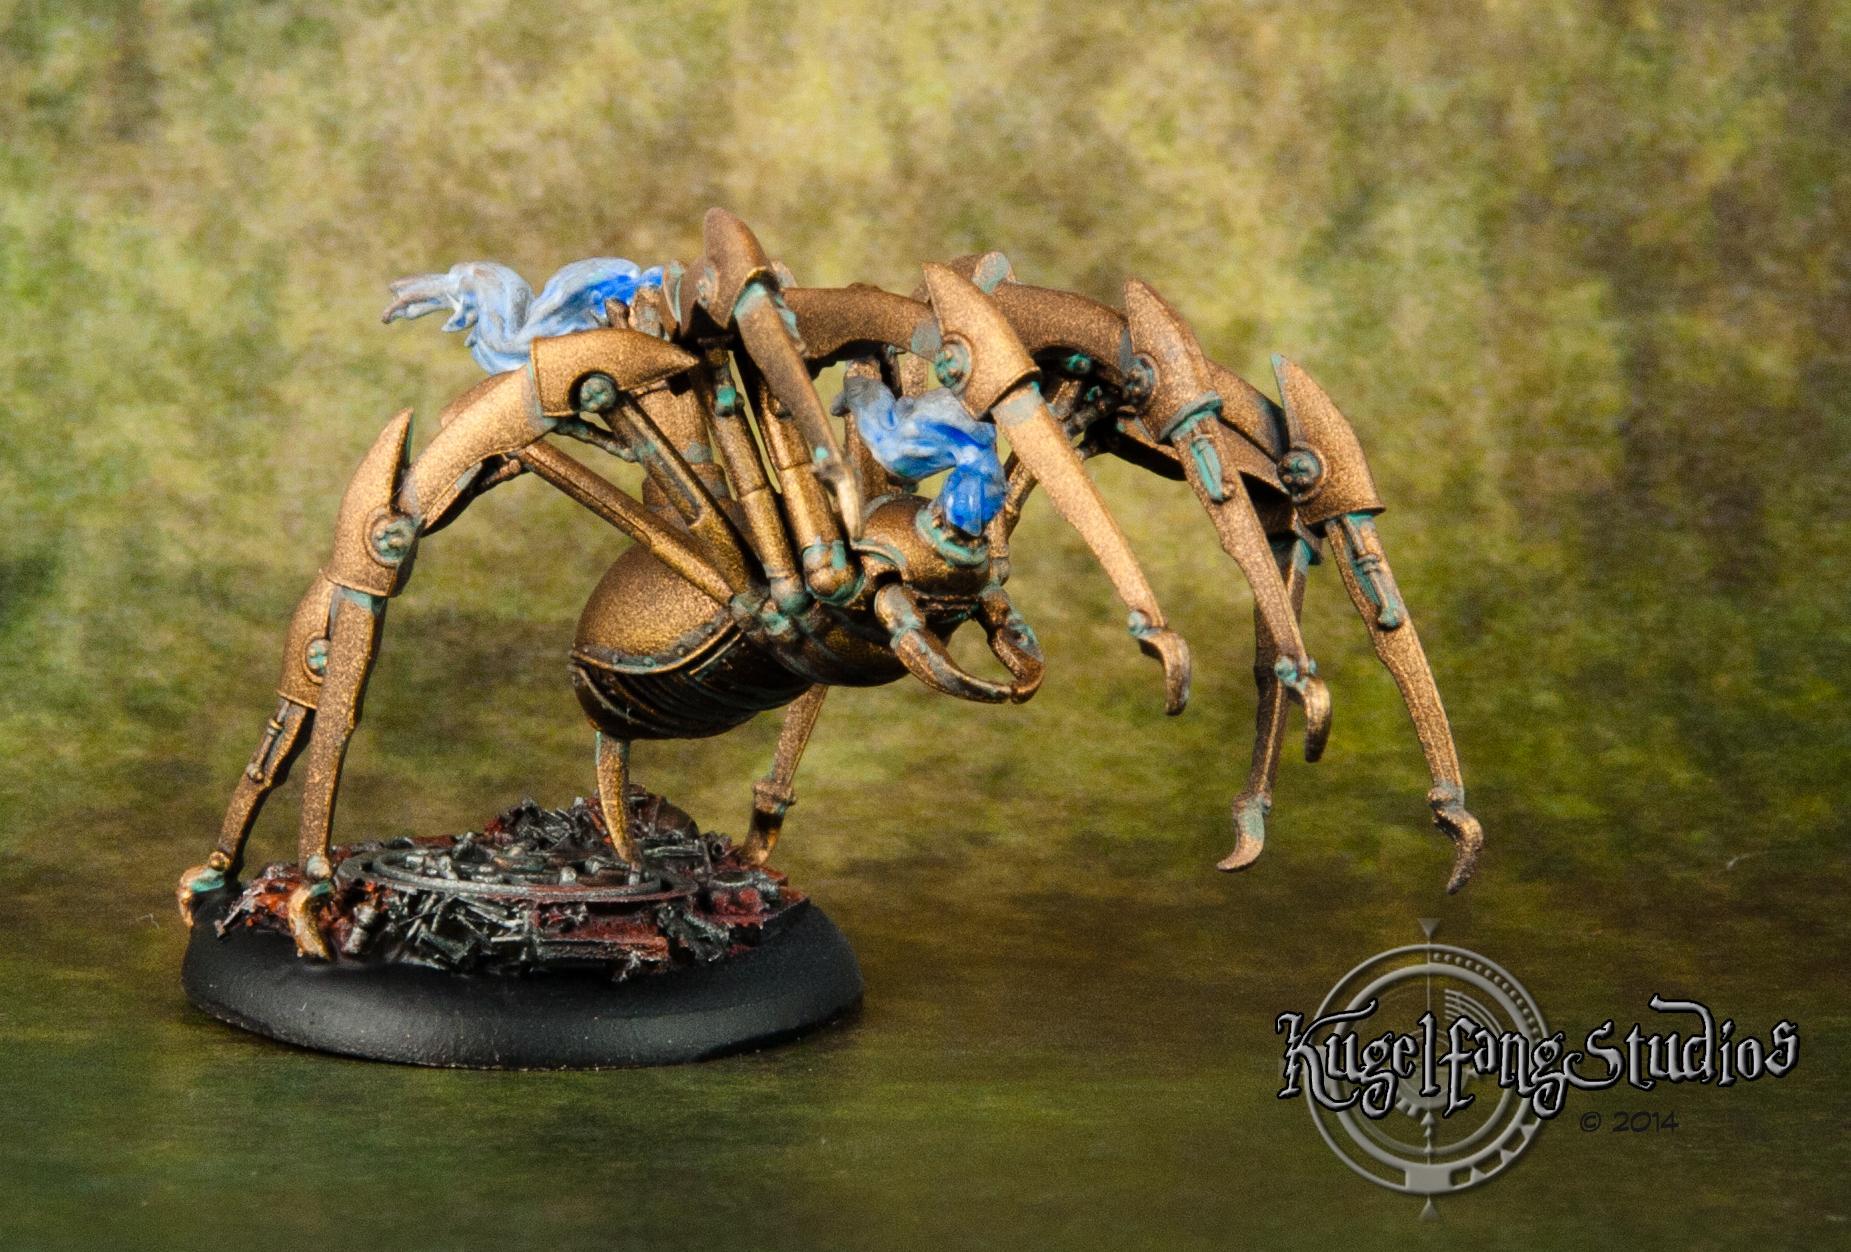 Arachnids, Brass, Howard, Joss, M&su, Malifaux, Punk, Ramos, Spider, Steam